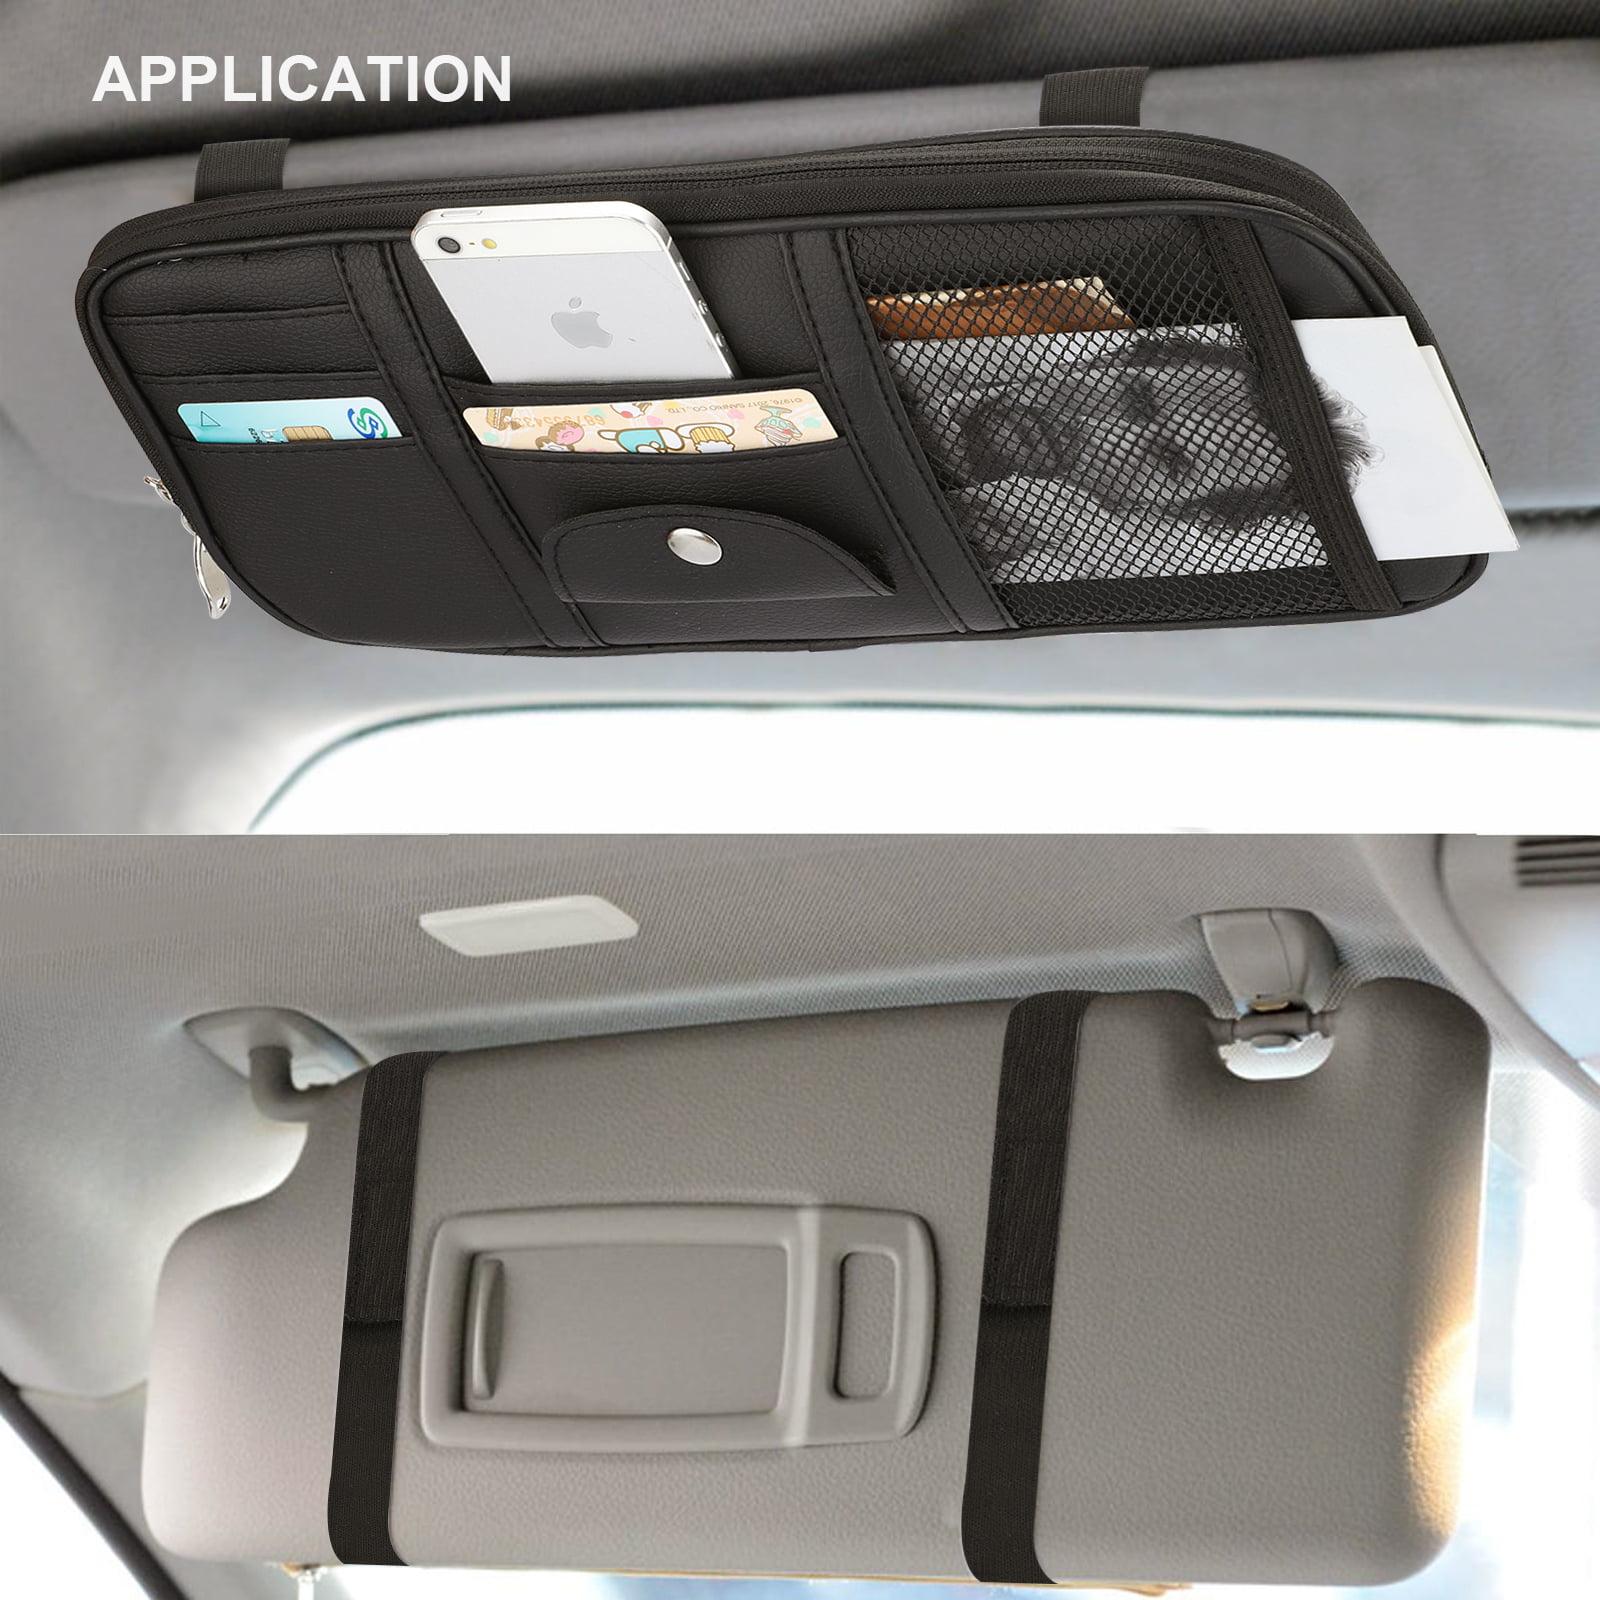 Beige 3 Mesh VXAR Car Sun Visor Organizer Pocket Storage Pouch Case Leather Holder Portable